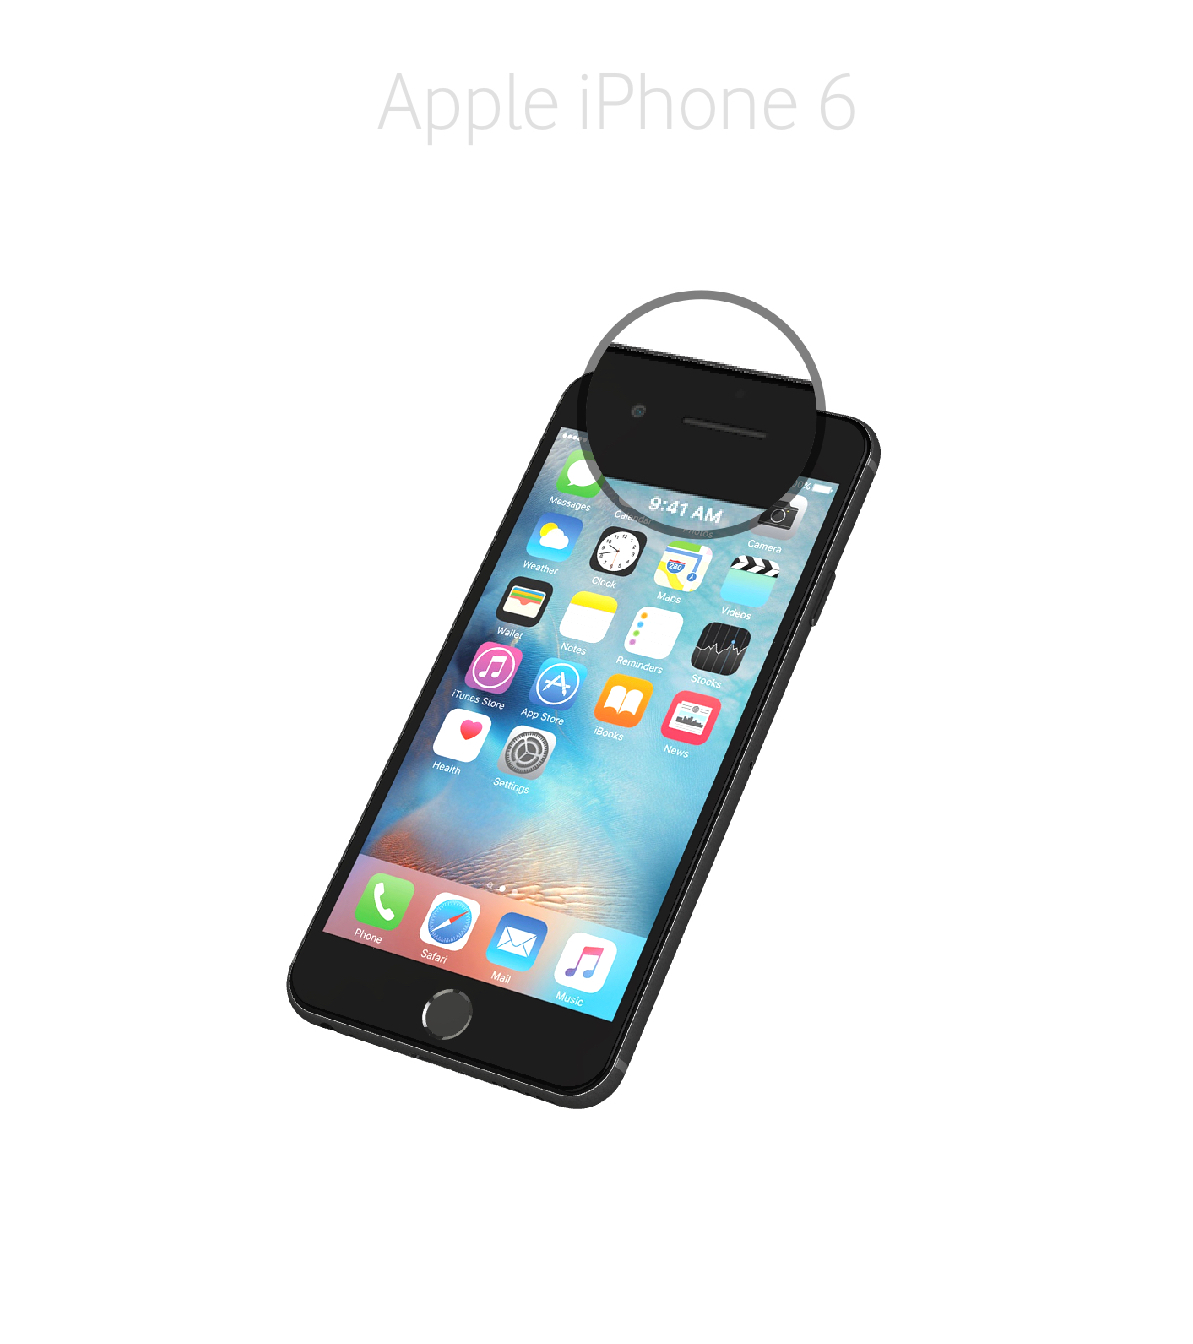 Laga samtalshögtalare iPhone 6